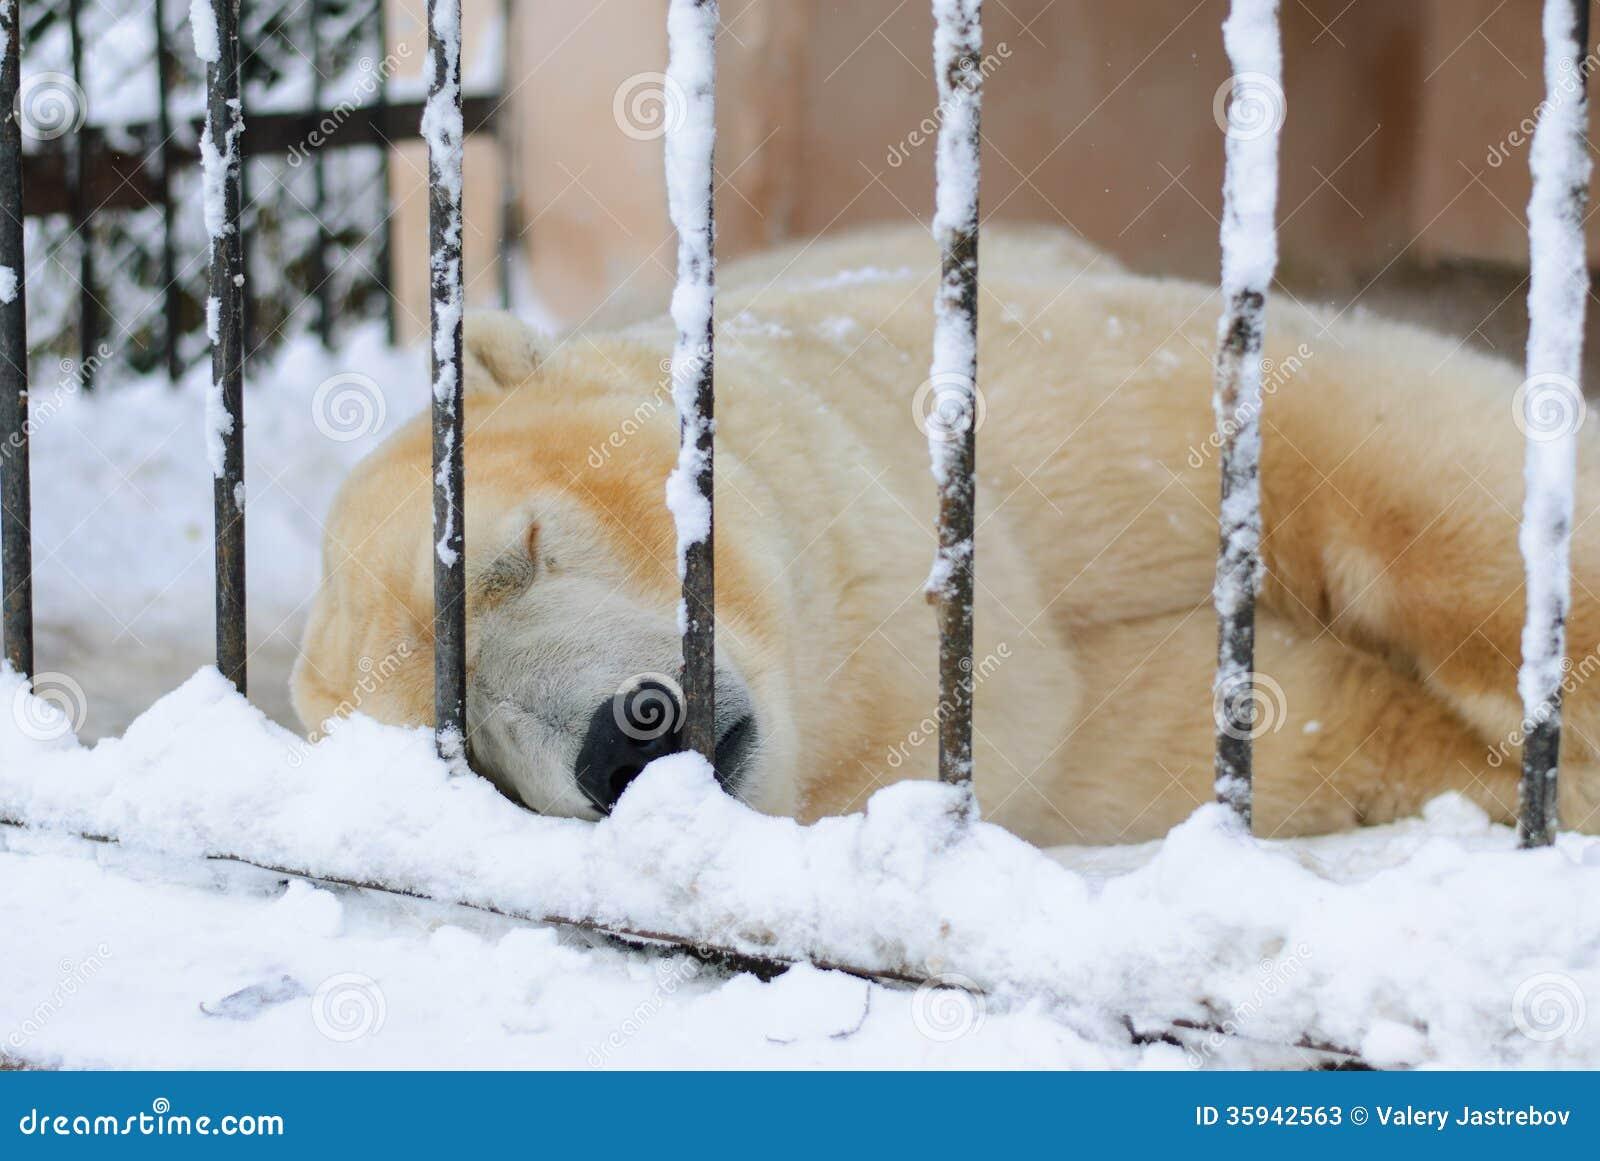 polar bear sleeping in a cage stock photos image 35942563. Black Bedroom Furniture Sets. Home Design Ideas